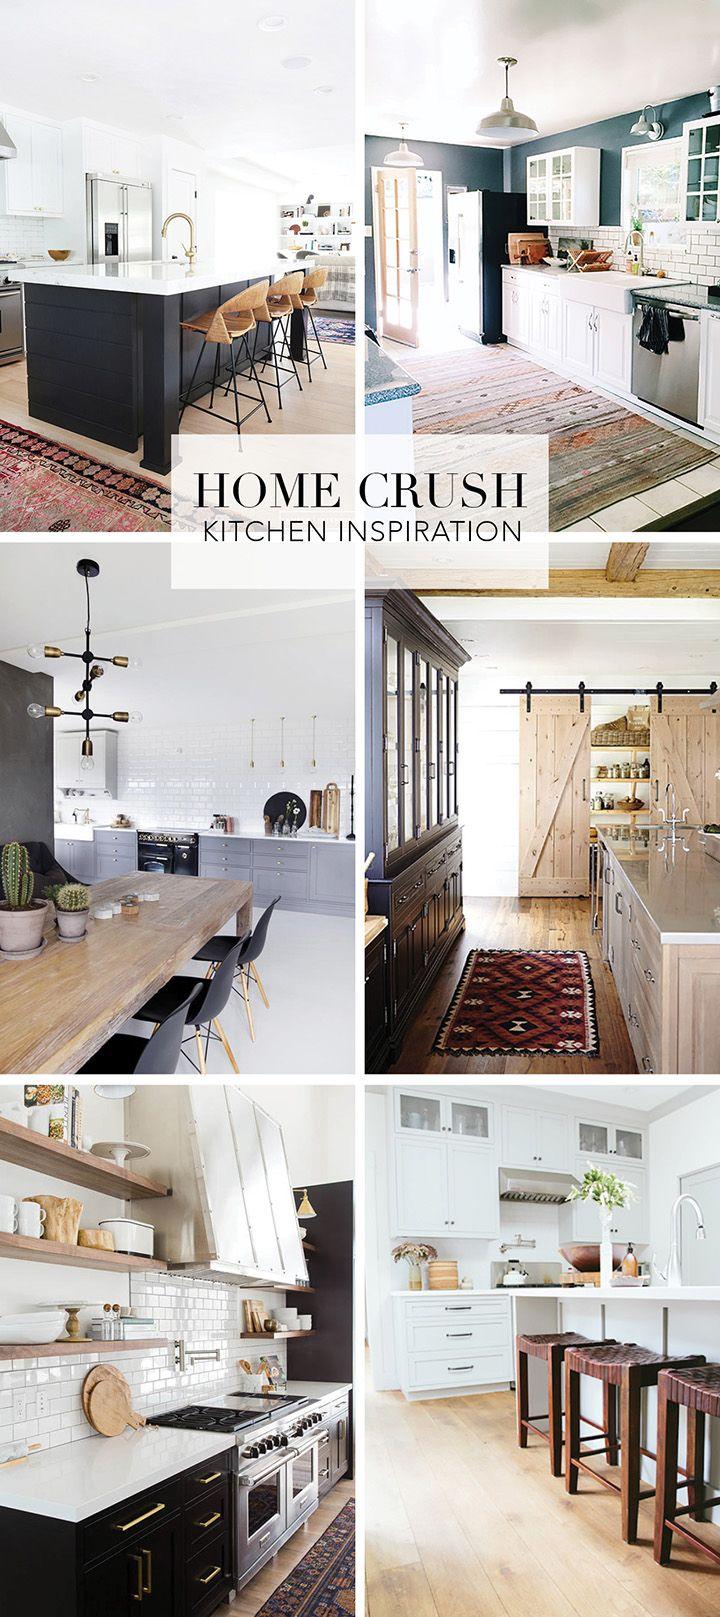 Home Crush – Kitchen Inspiration | Pinterest | Crushes, Kitchens and ...